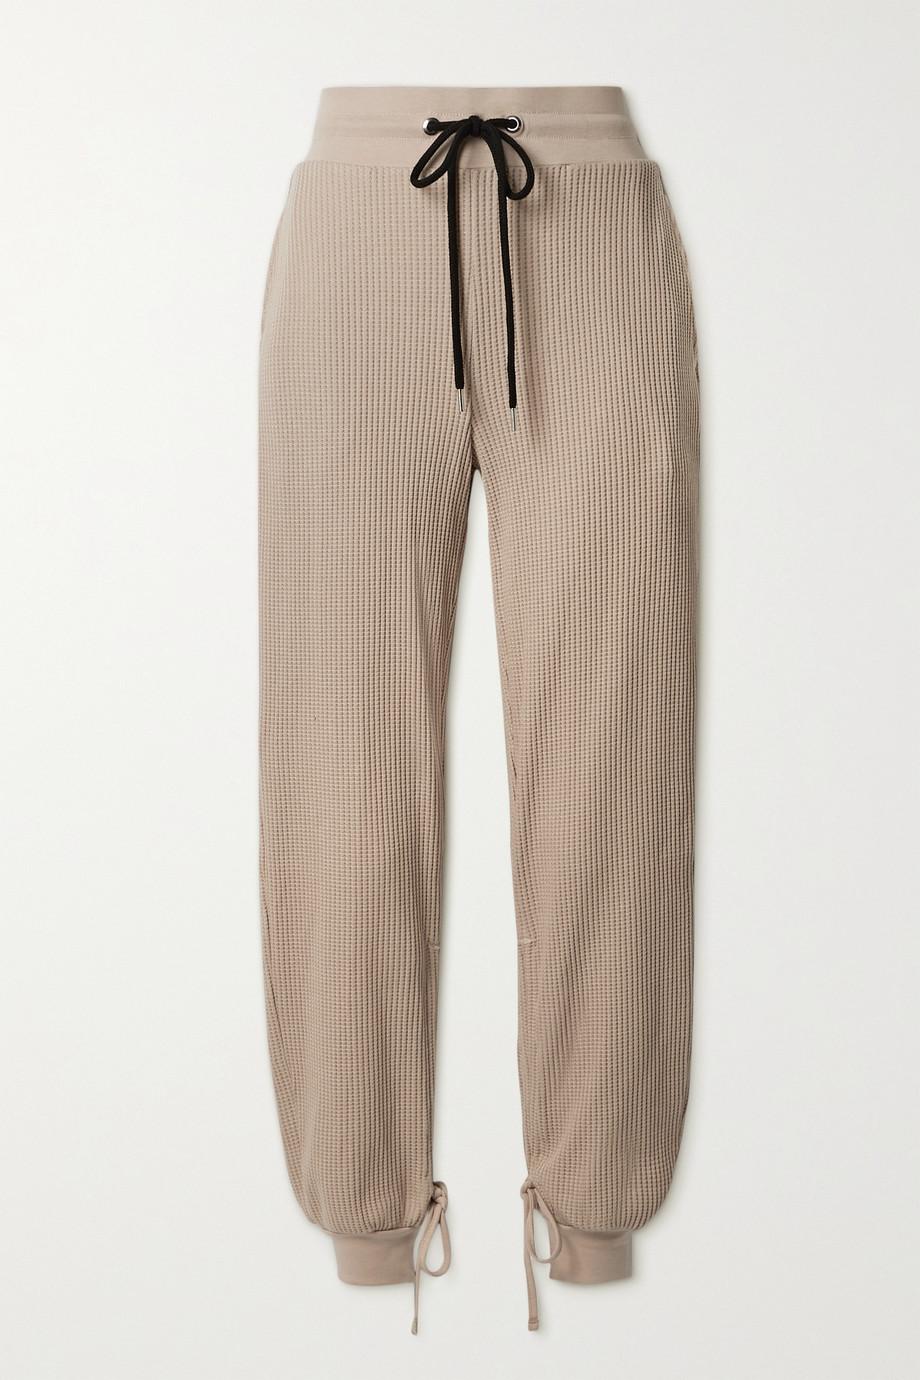 The Range Stark 华夫格针织棉质混纺休闲裤